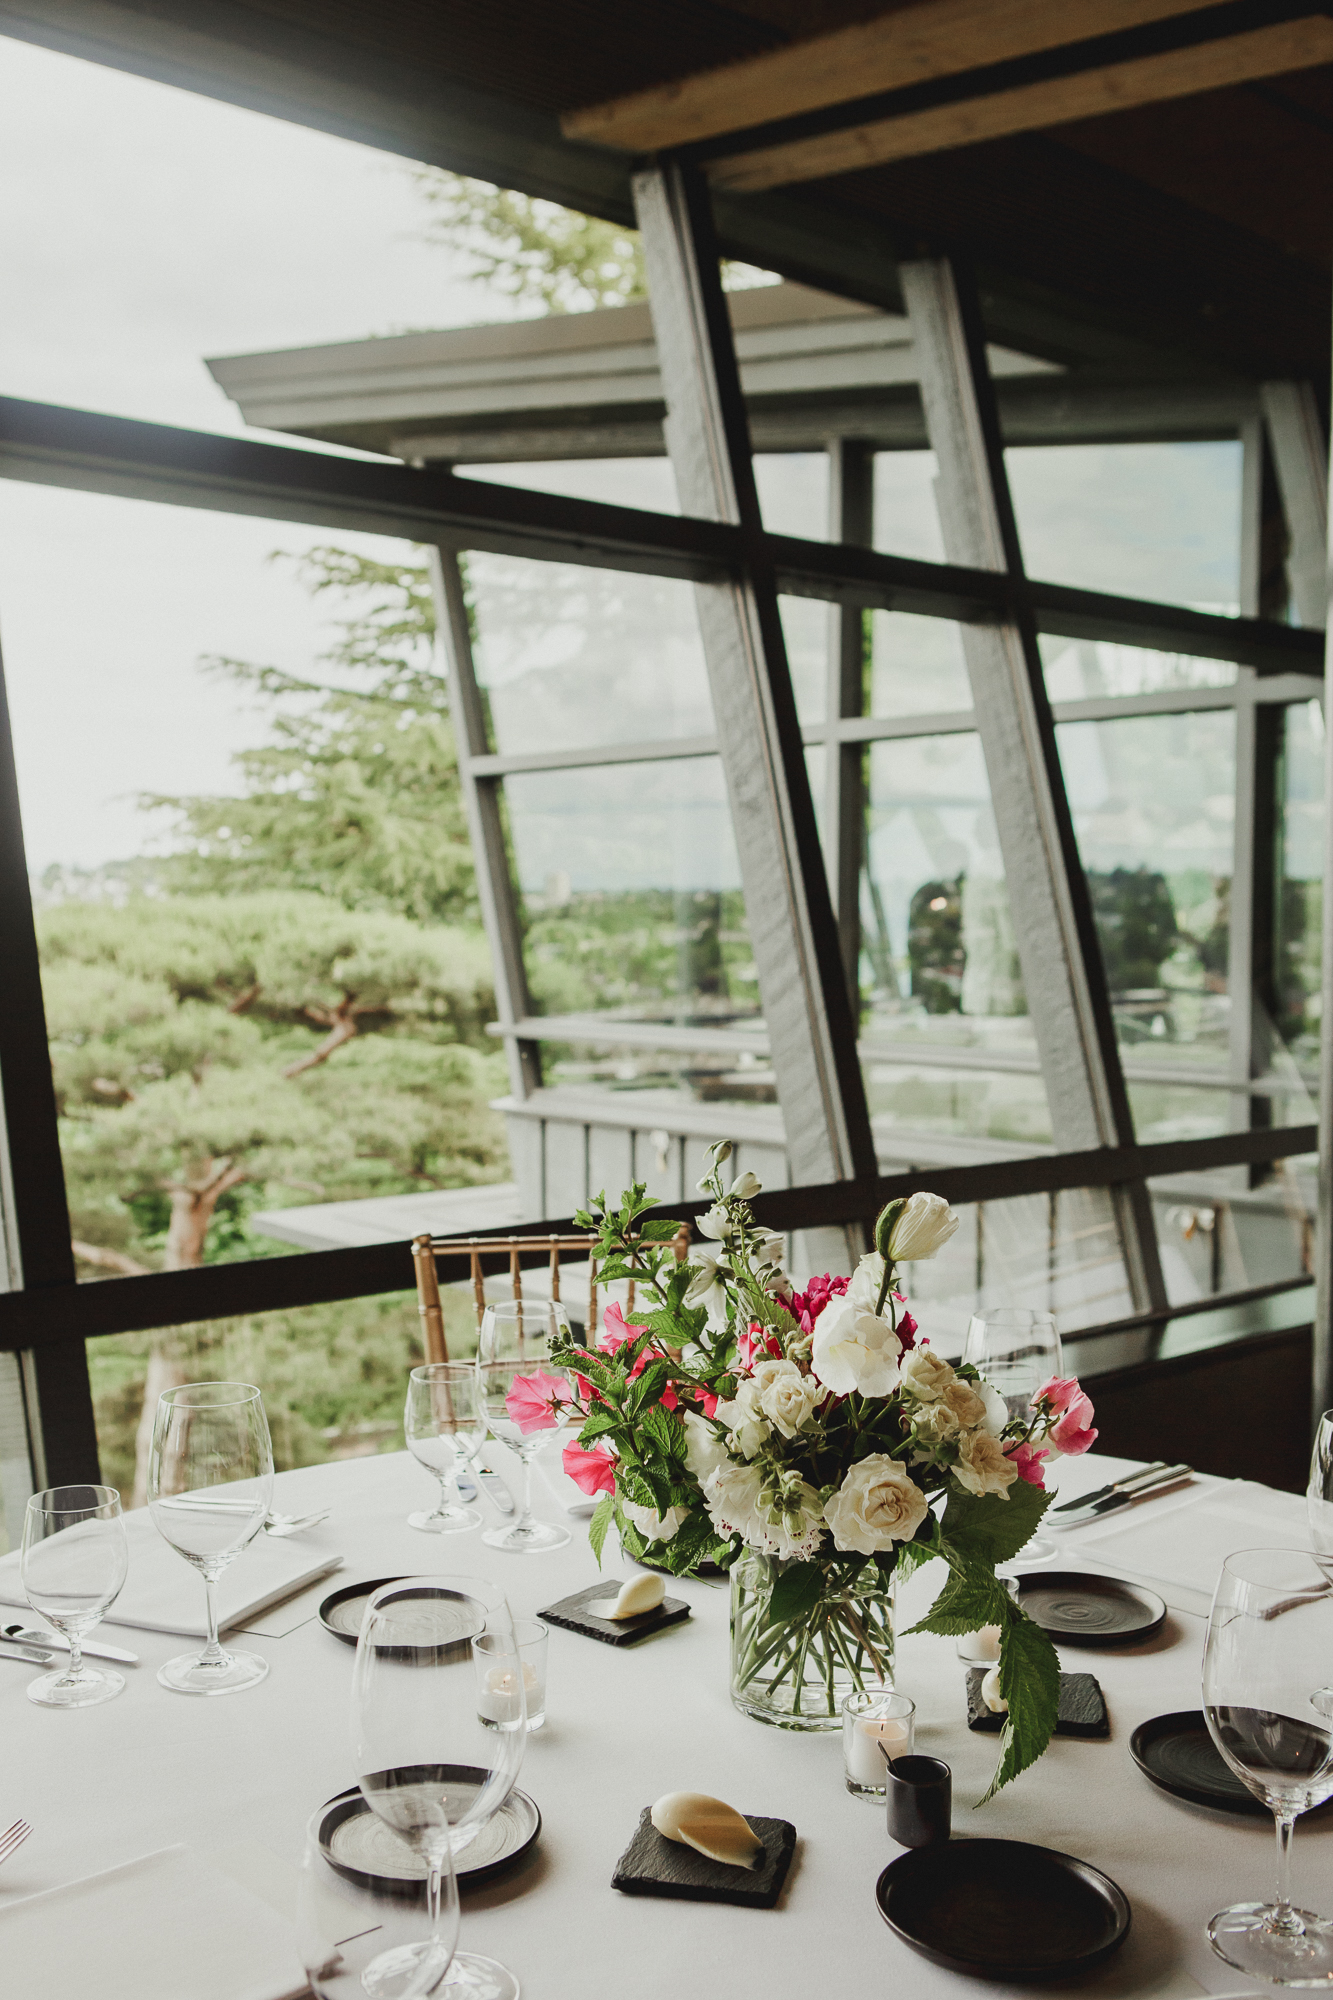 canlis restaurant wedding photos by Krista Welch-0037.jpg